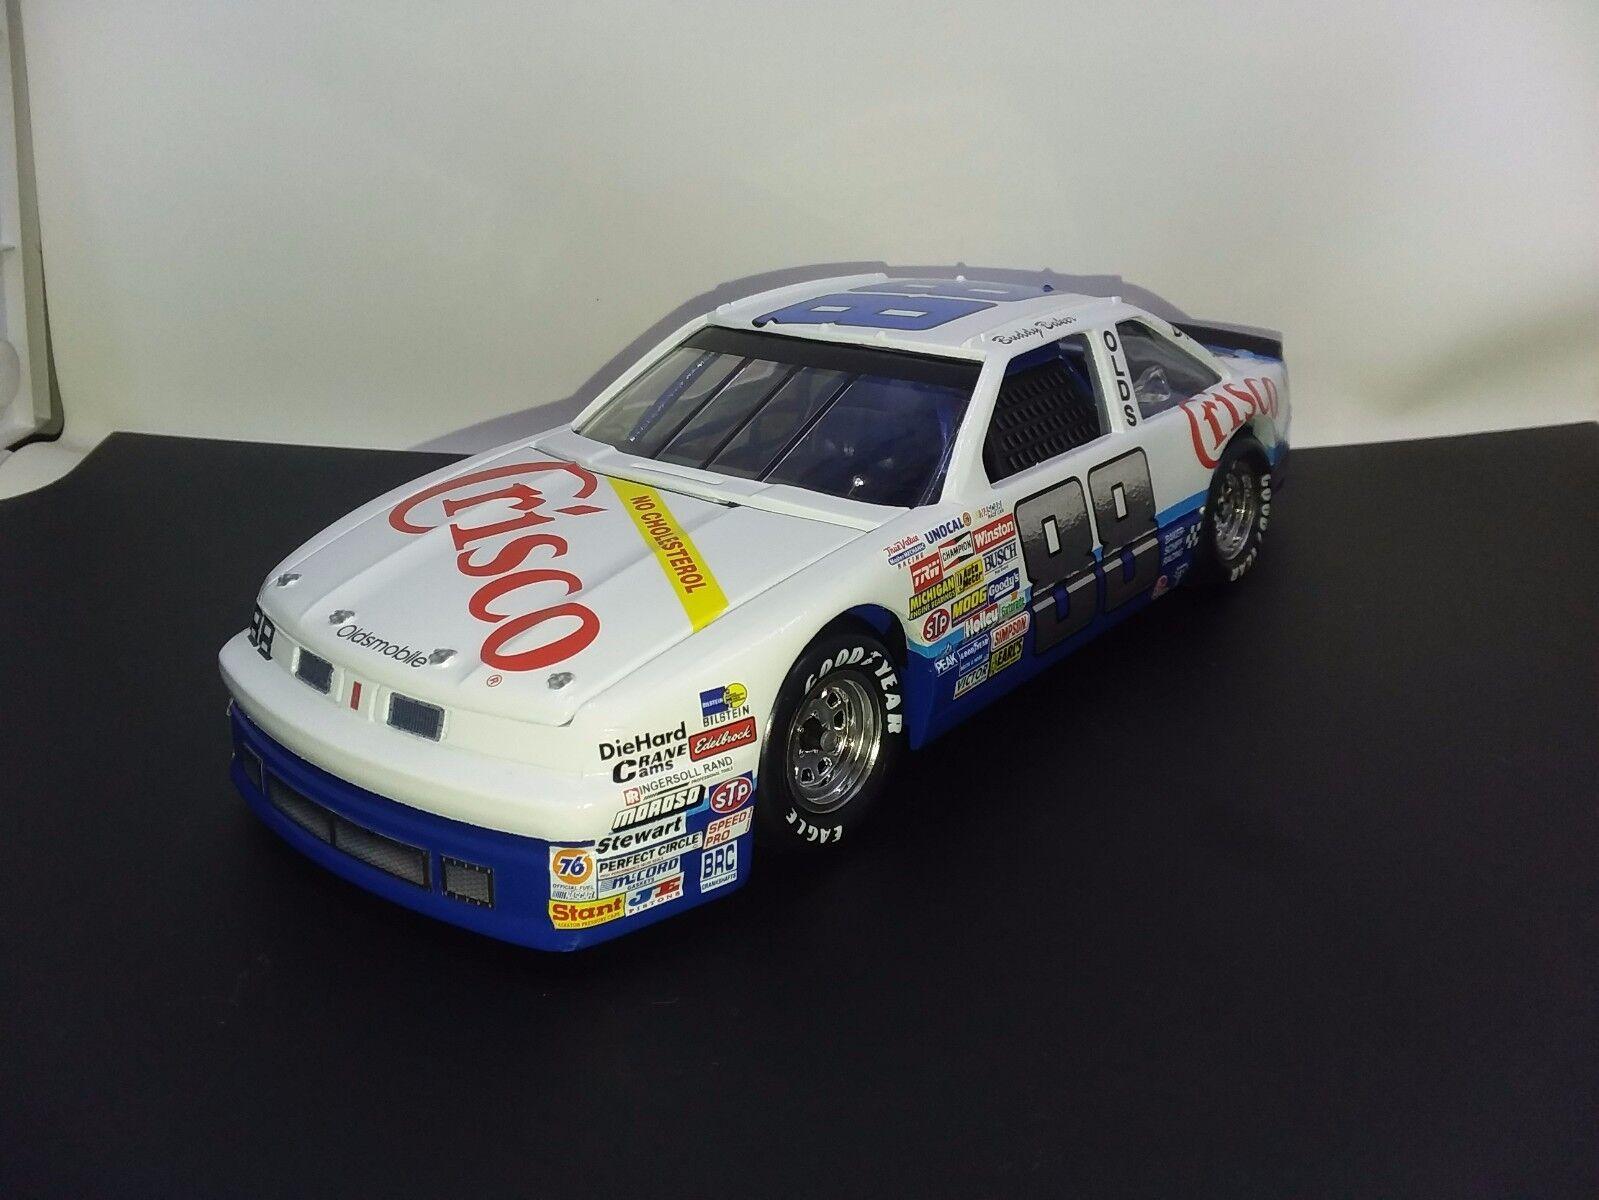 bienvenido a comprar Raro 1987 Buddy Baker NASCoche NASCoche NASCoche Winston Cup Series  88 Crisco 1 24 Diecast Olds  soporte minorista mayorista